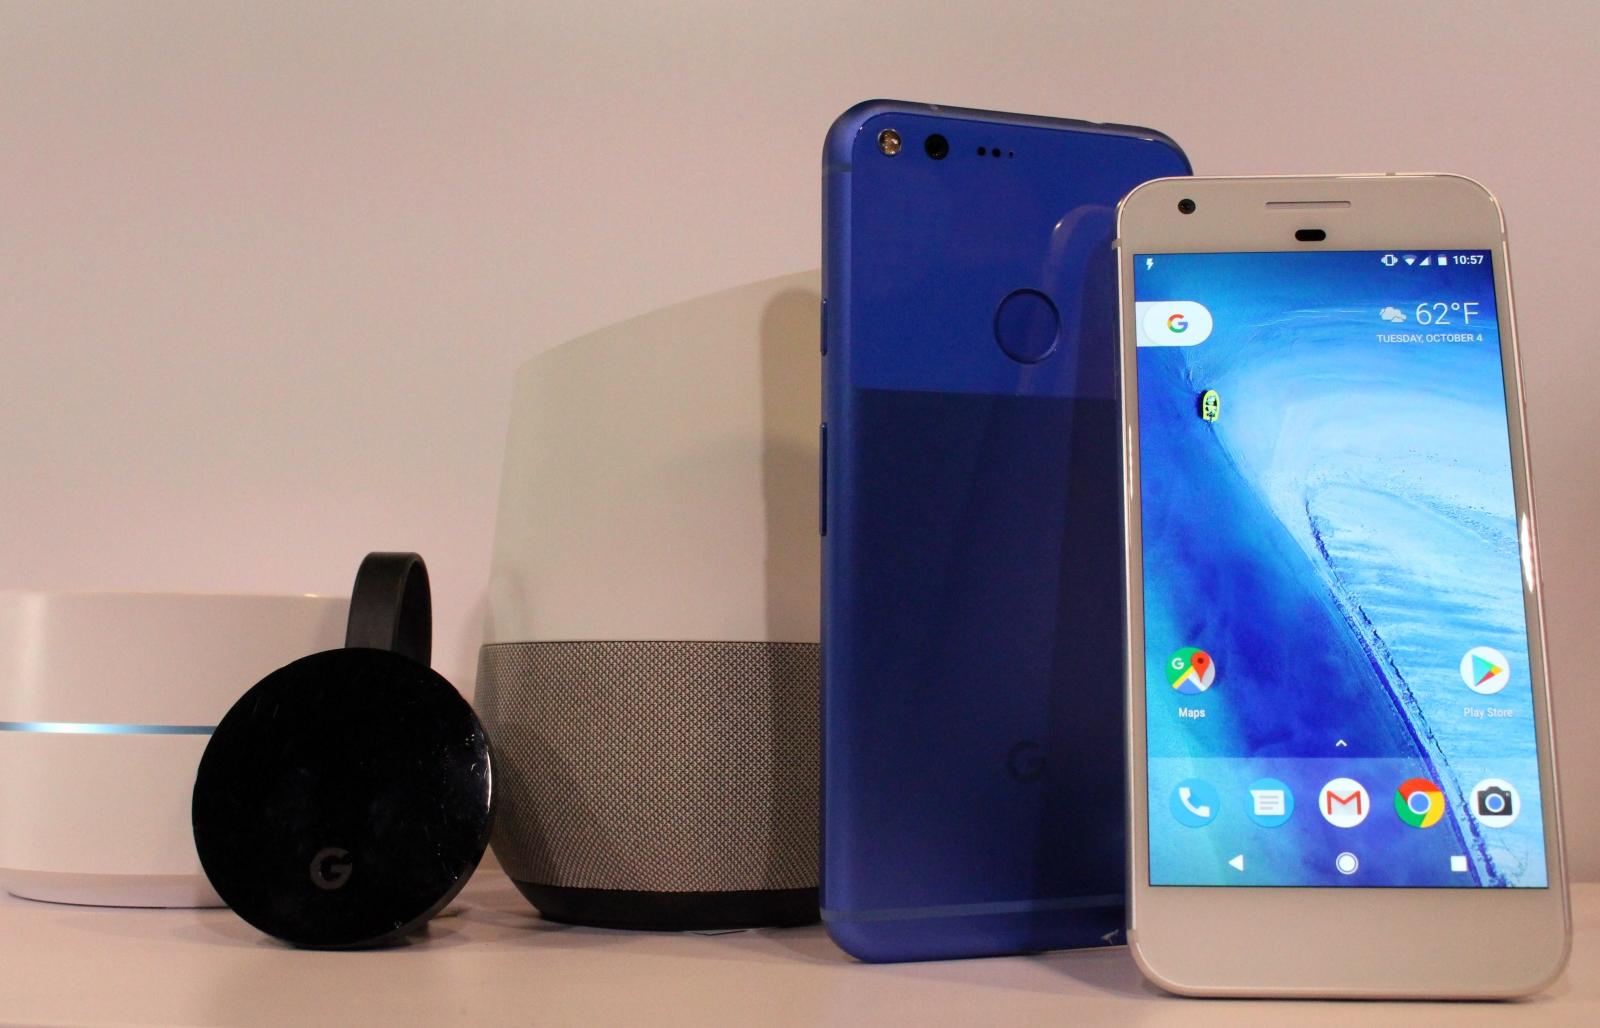 Google Pixel and Pixel XL software updates